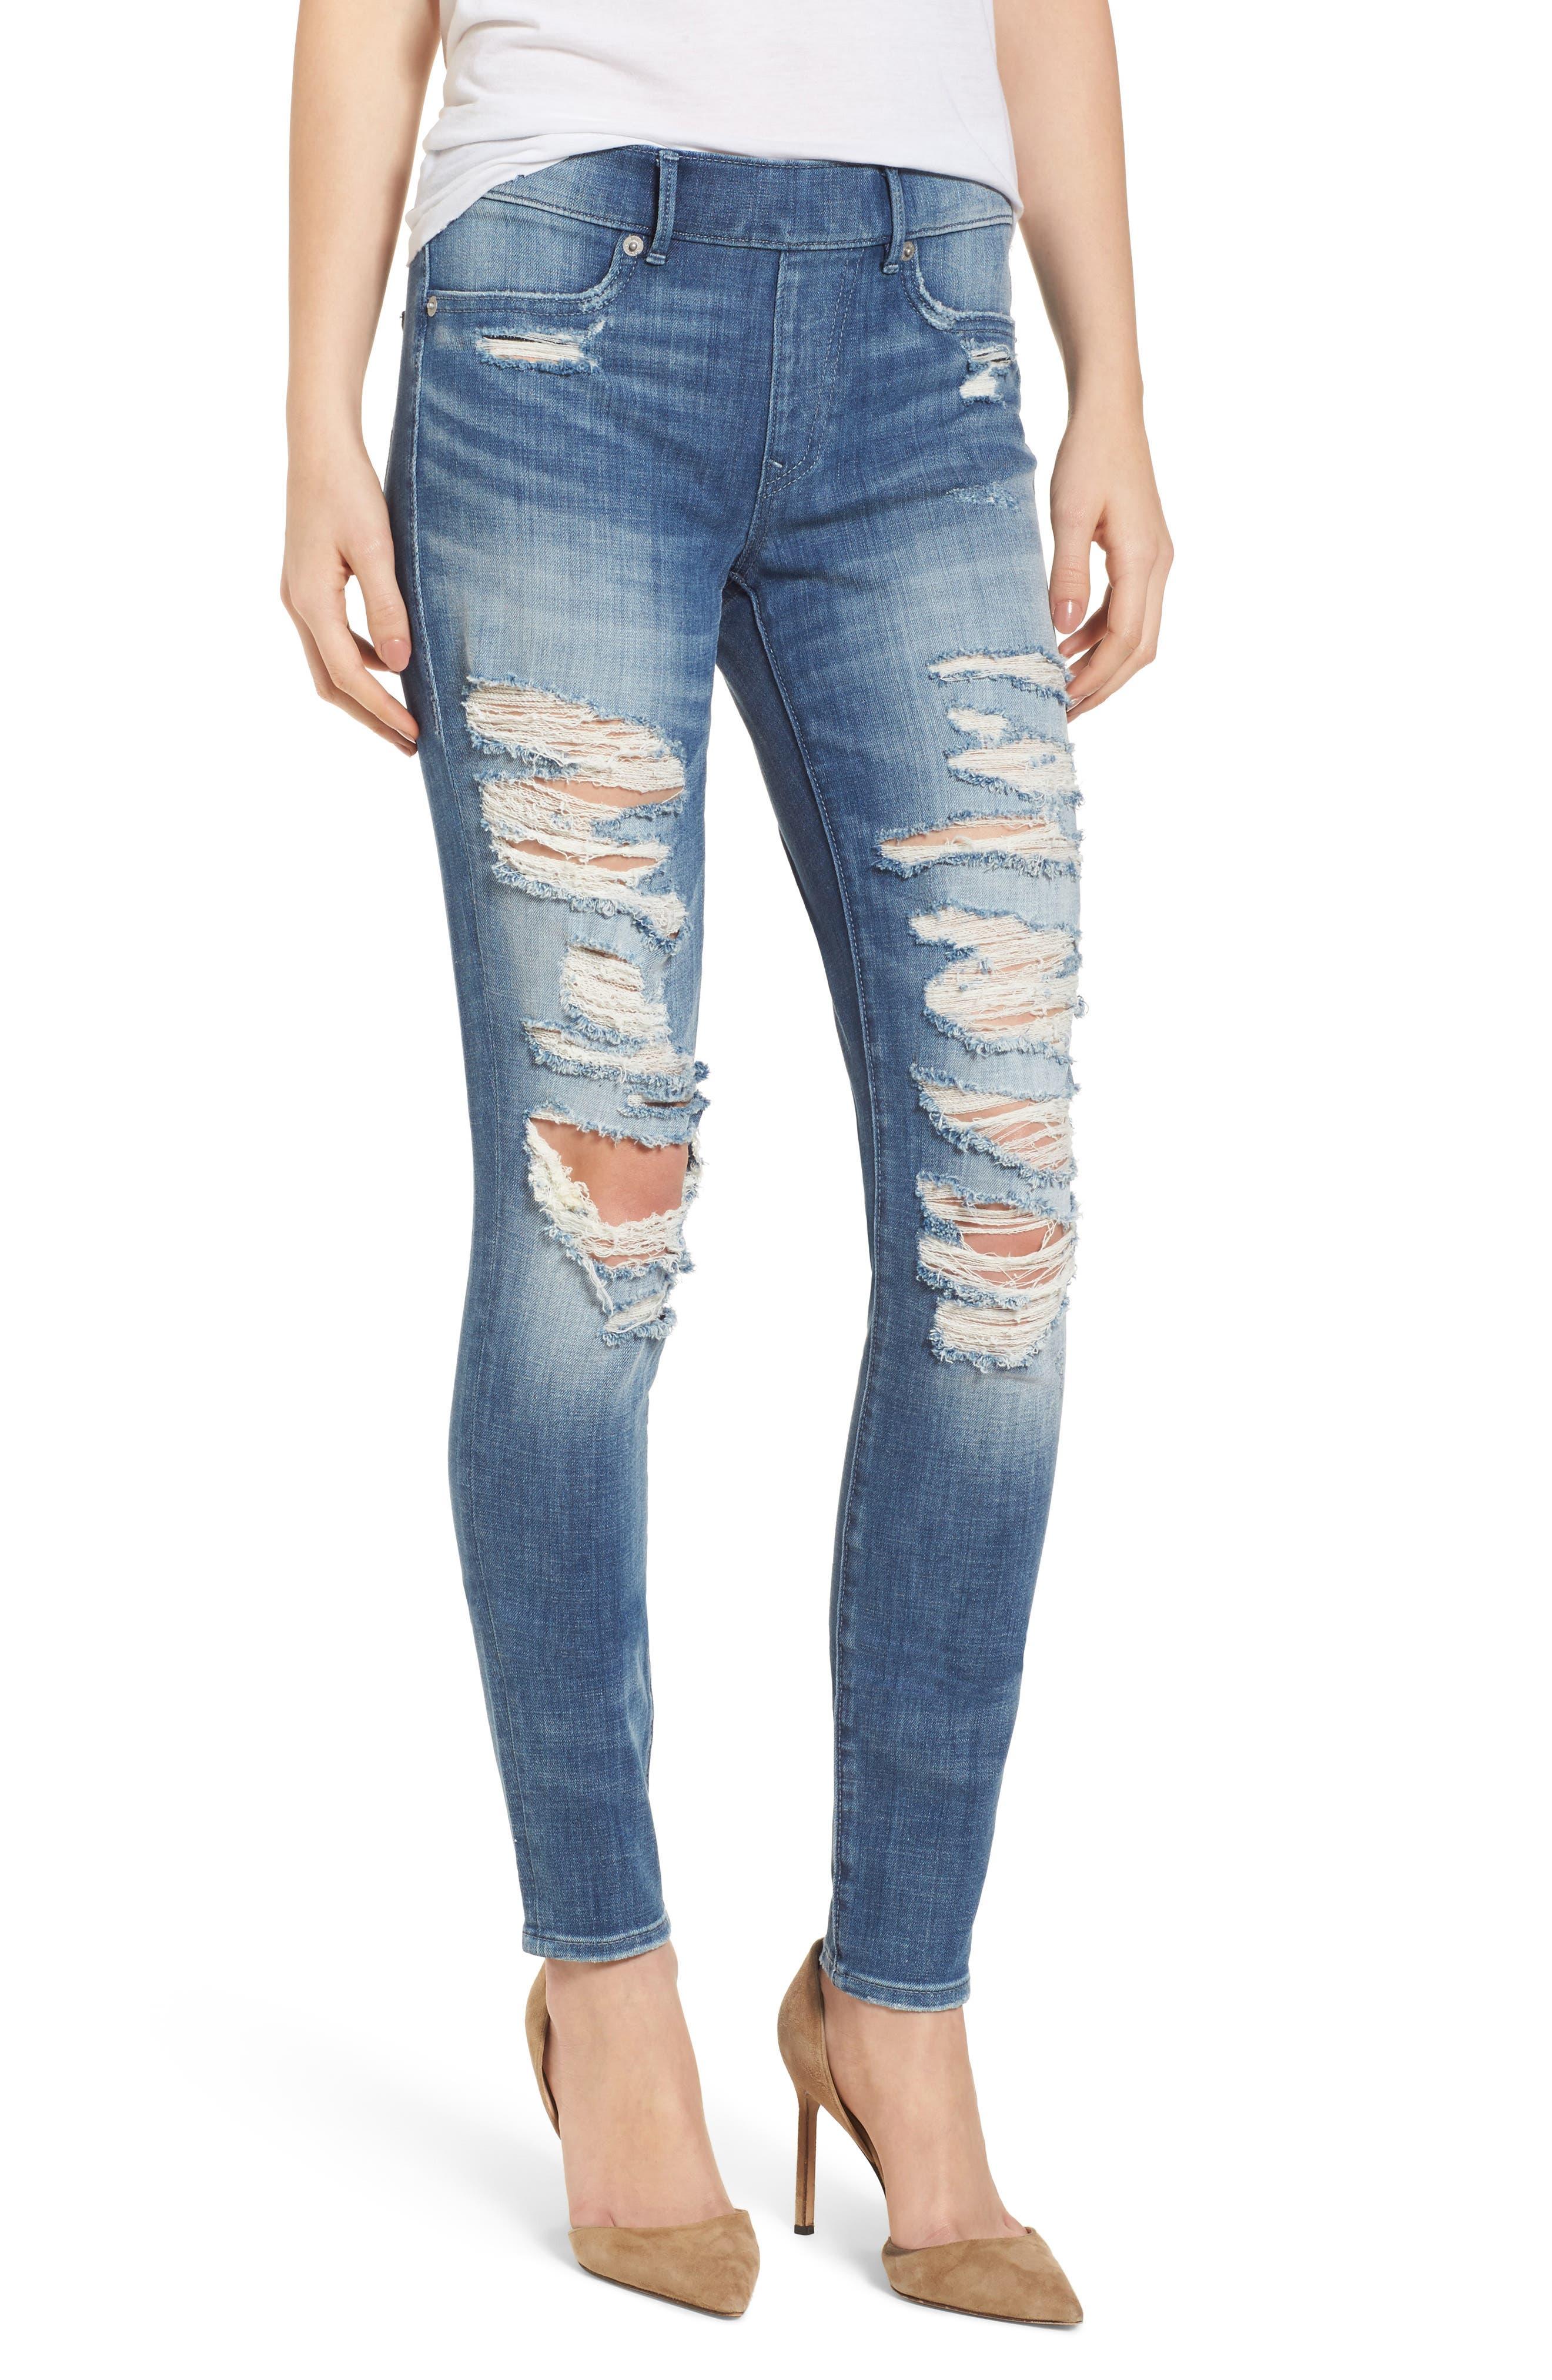 Jennie Runaway Legging Jeans,                         Main,                         color, 401